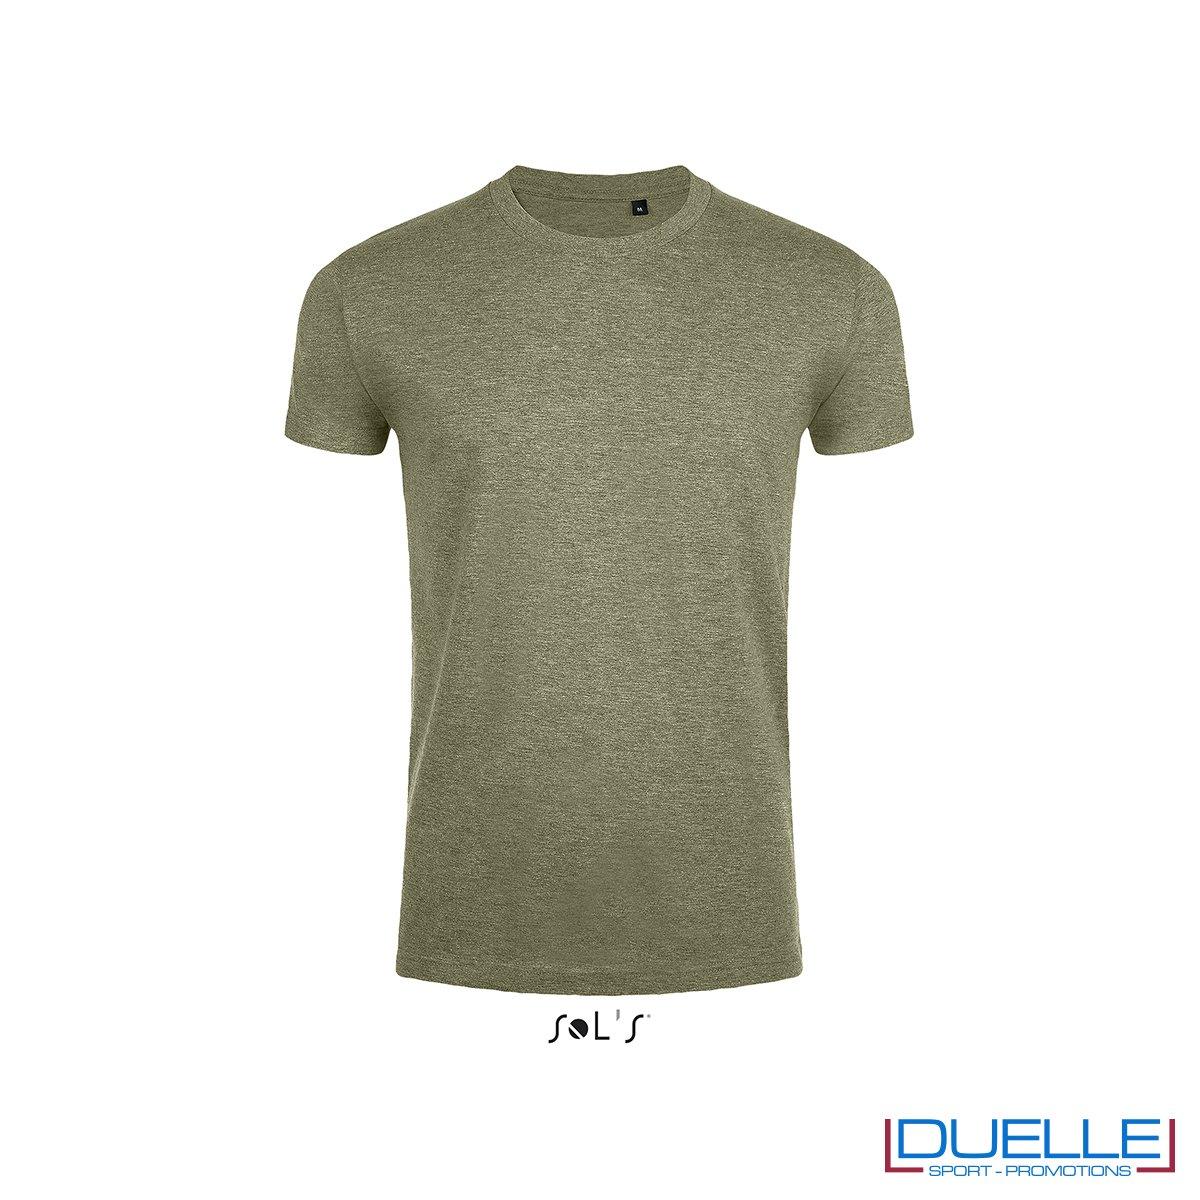 T-shirt girocollo slim fit uomo in cotone pesante colore kaki melange